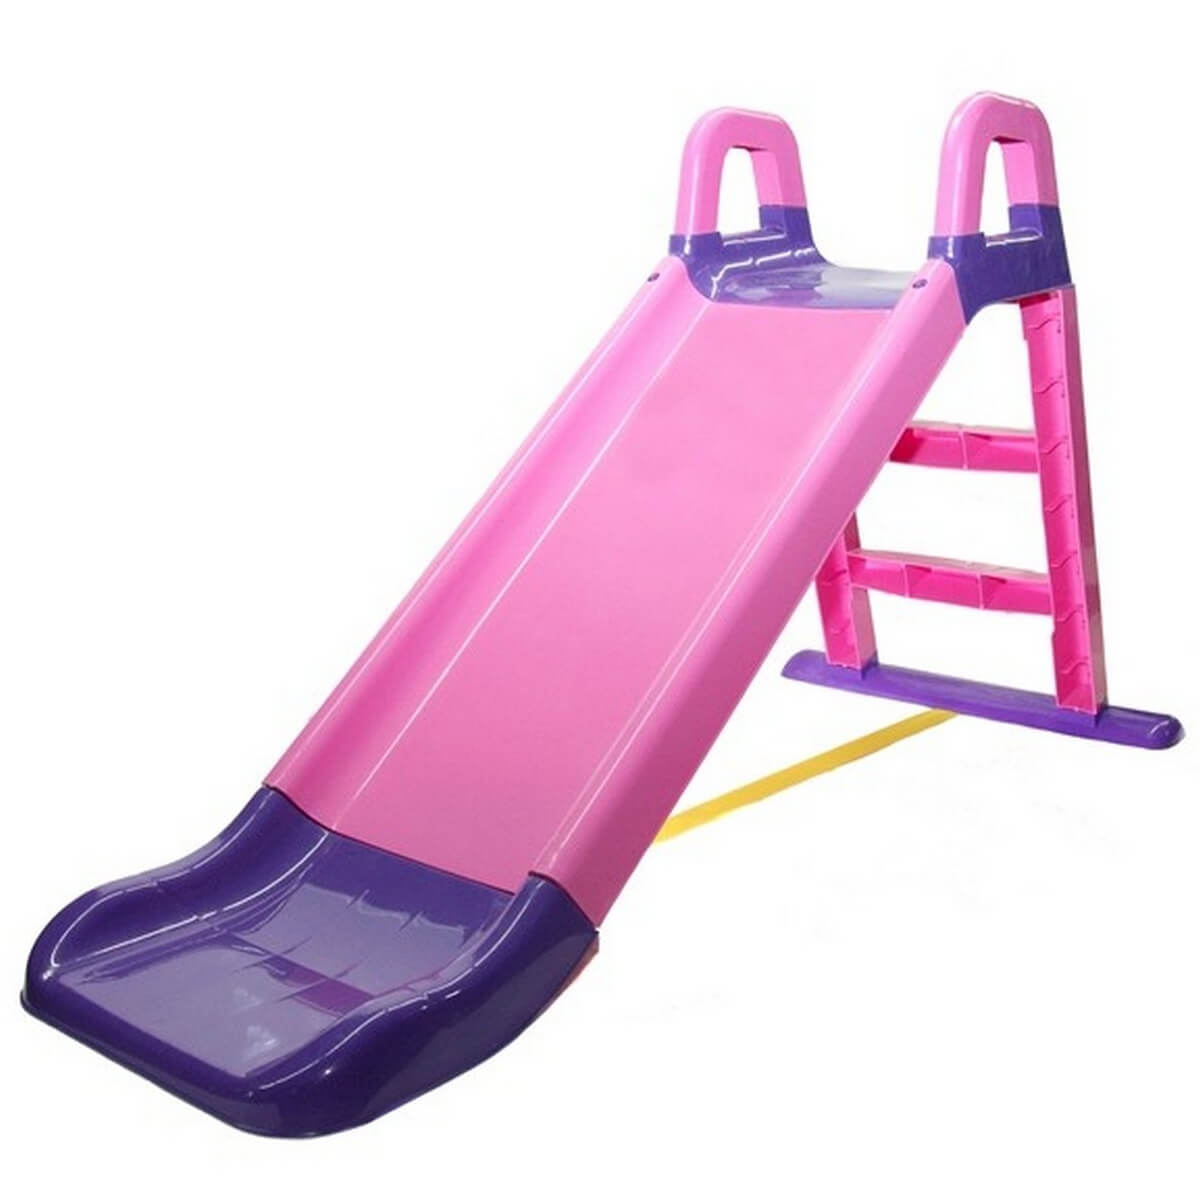 doloni Горка для катания детей розово-фиолетовая 0140/05